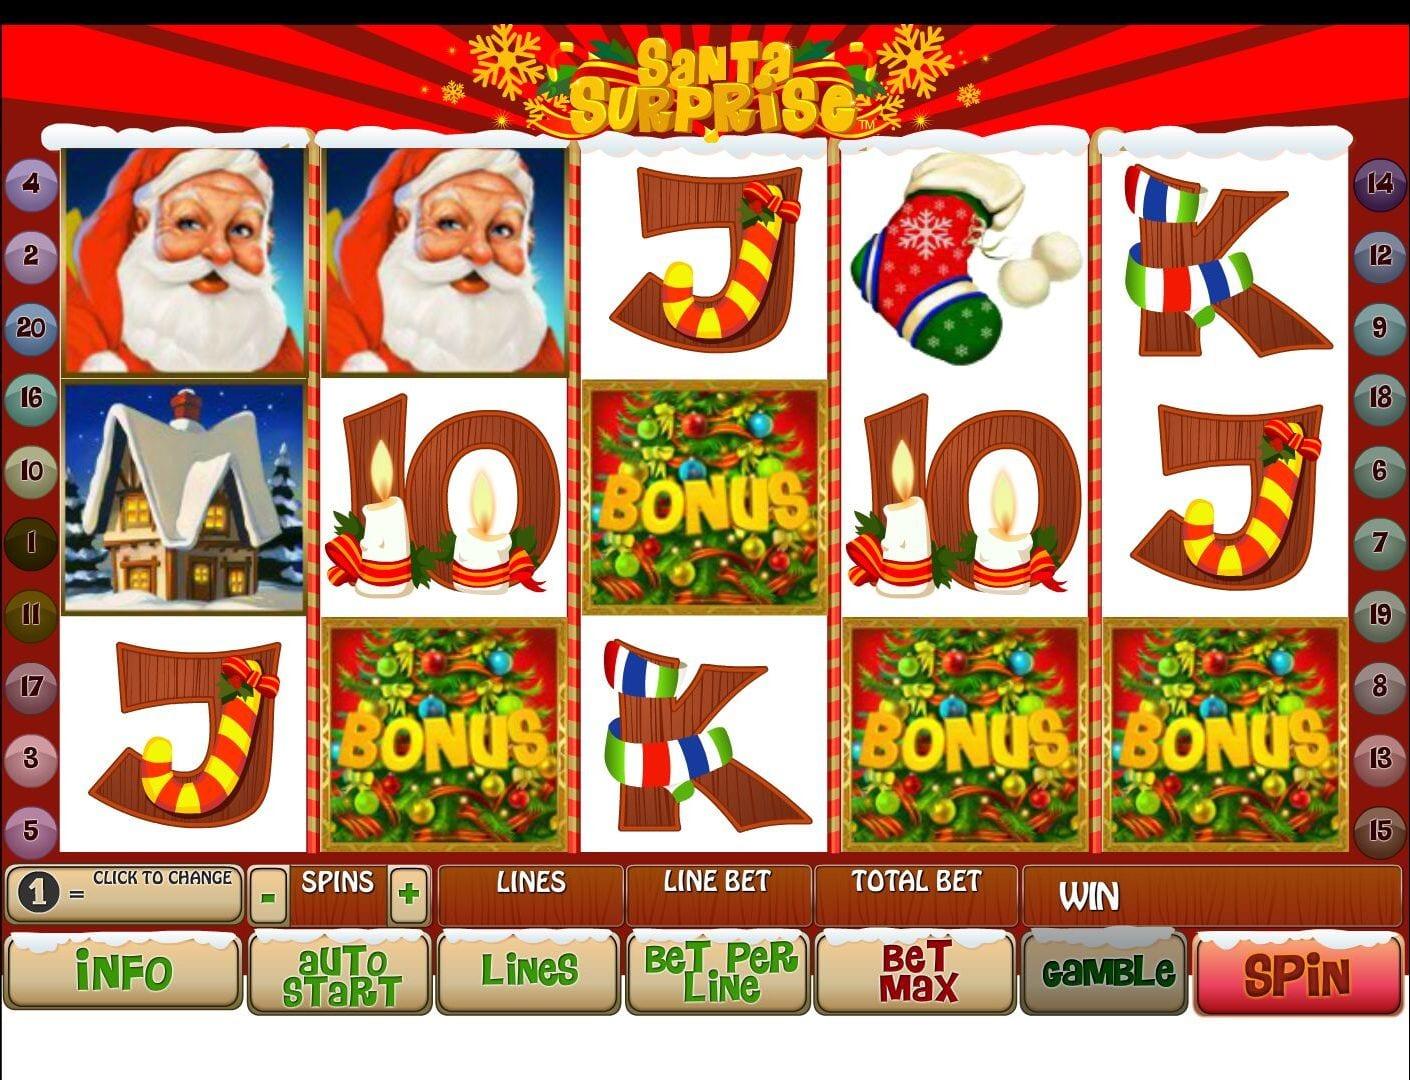 Santa Surprisegratis joc ca la aparate online